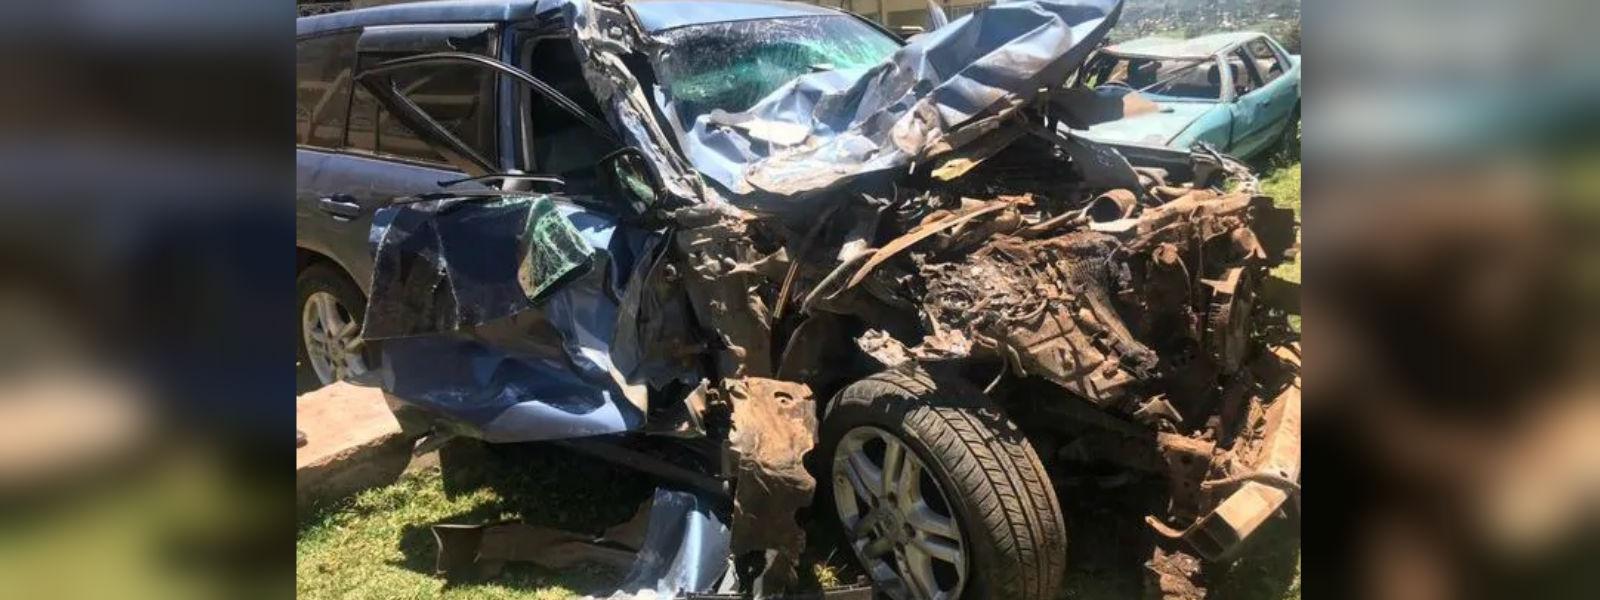 Rudisha escapes unhurt from bus collision in Kenya